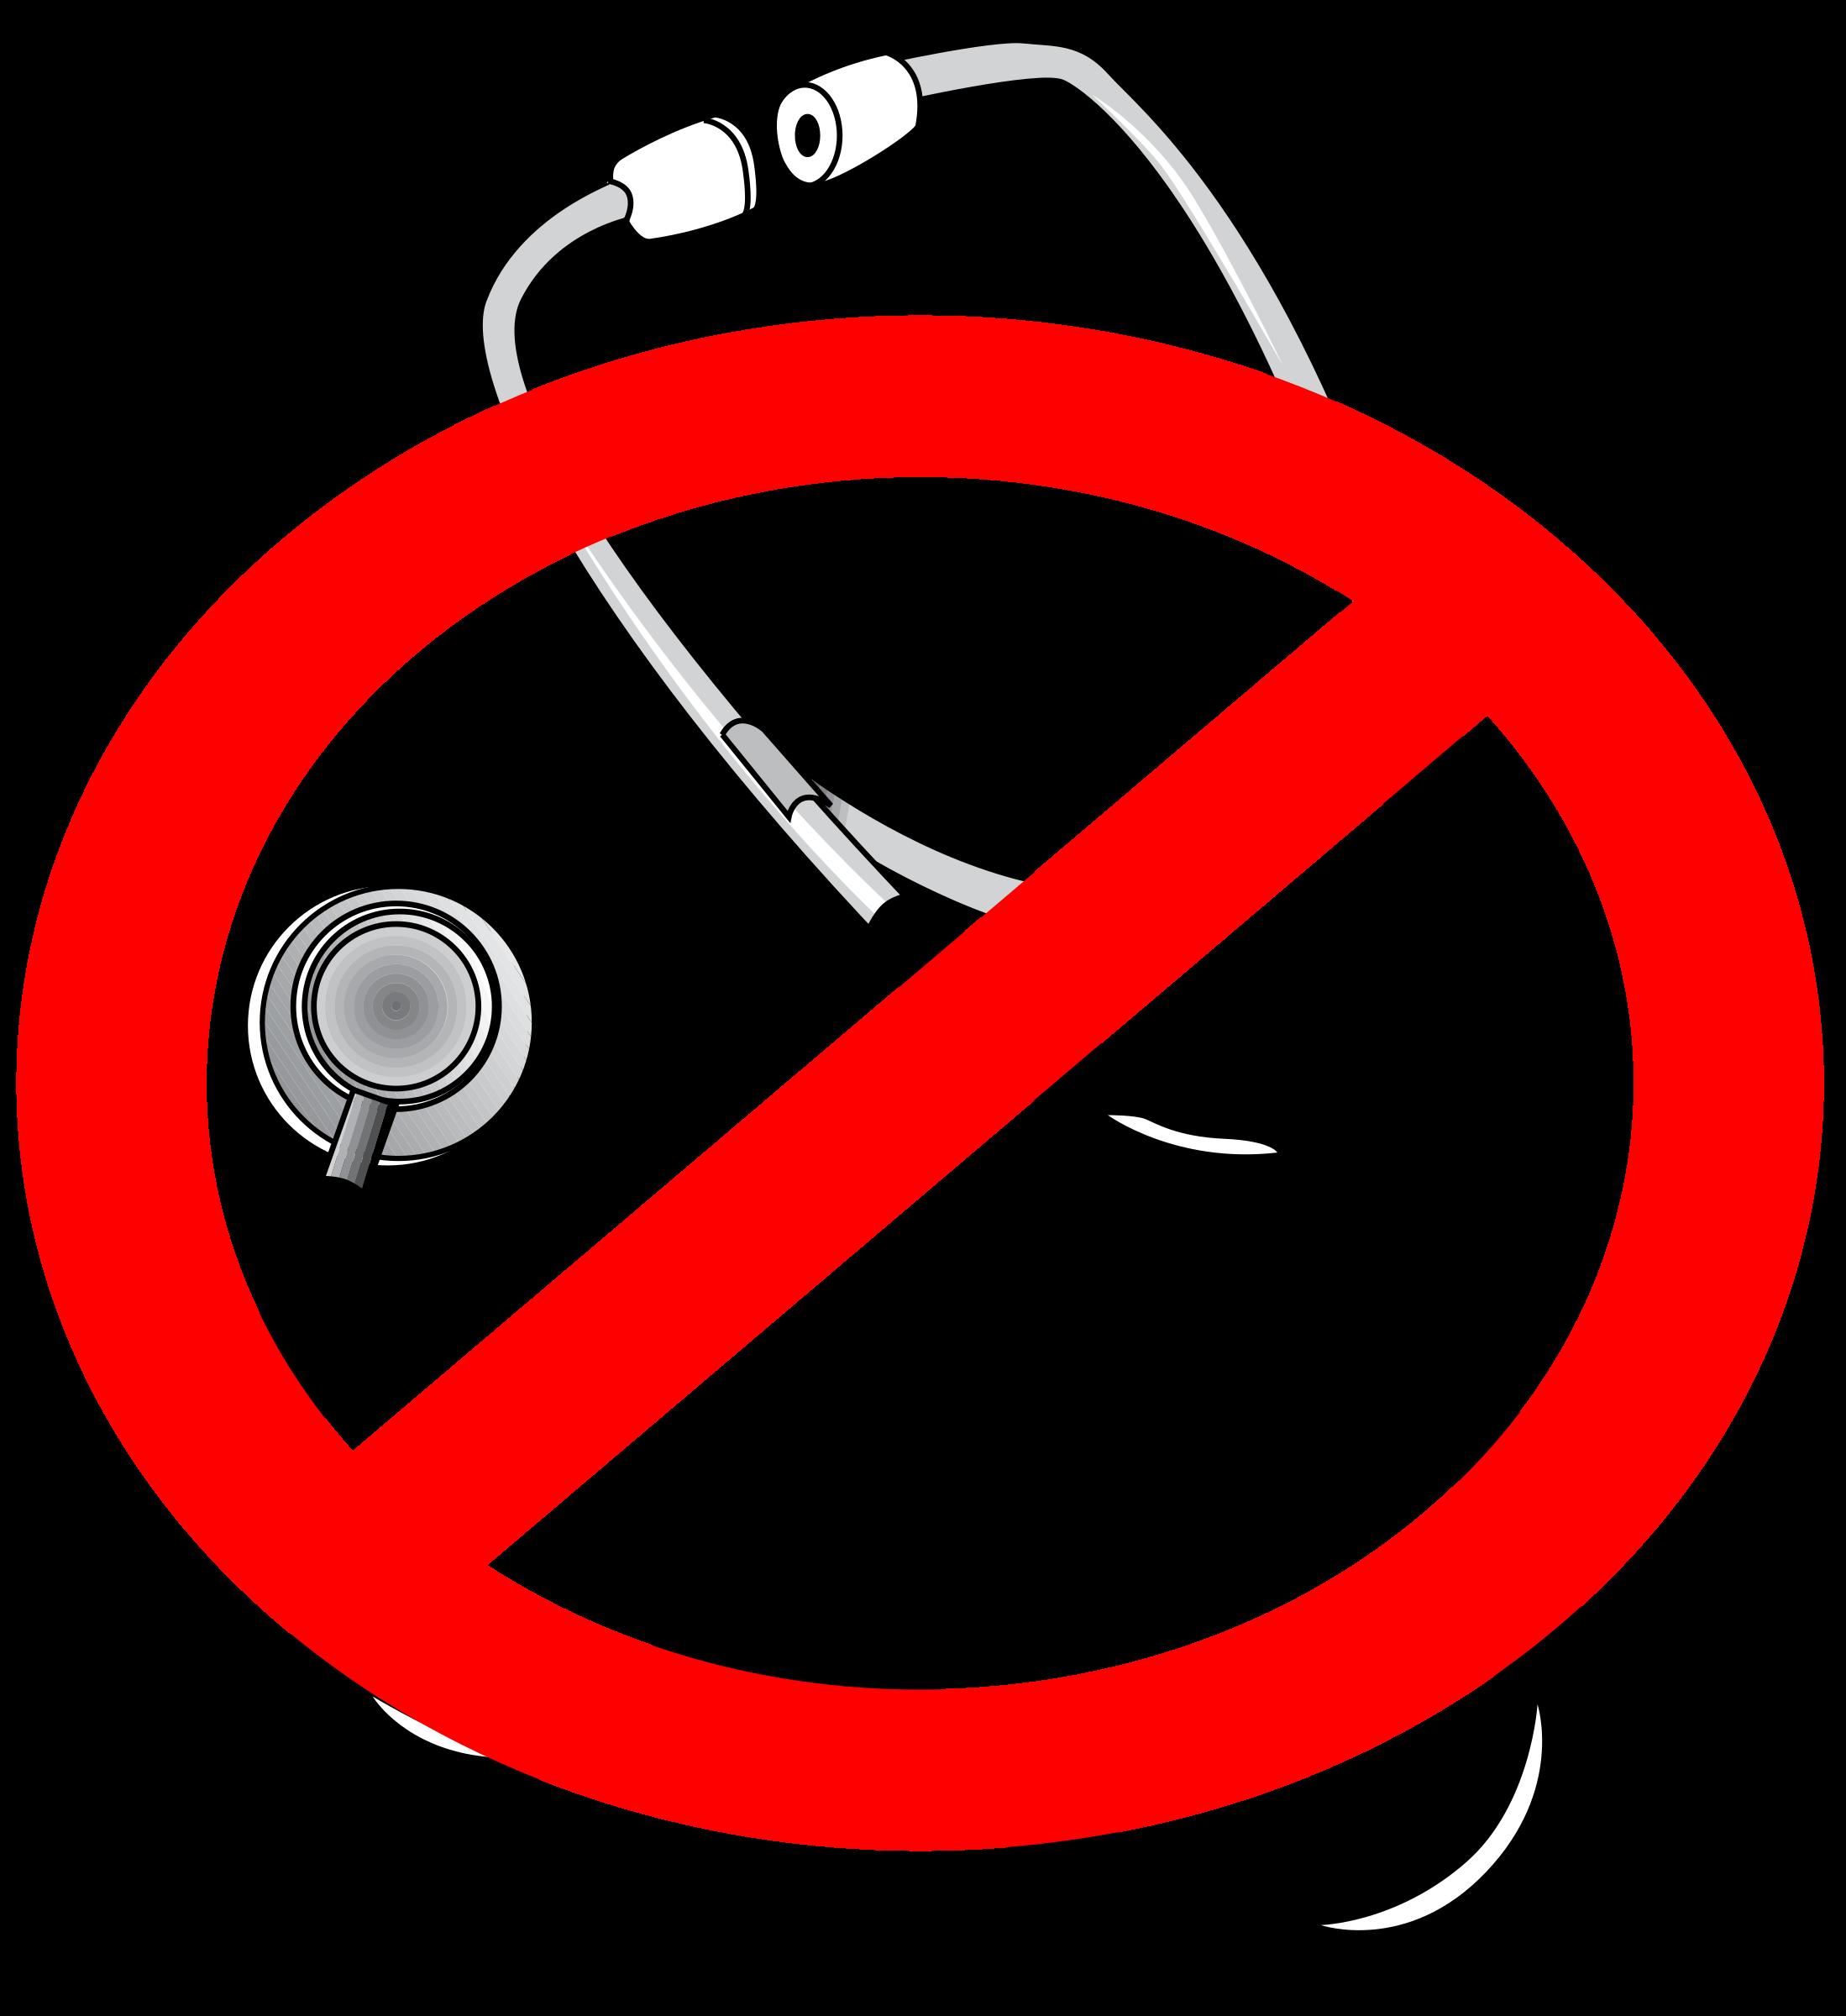 No doctors big image. Circle clipart doctor